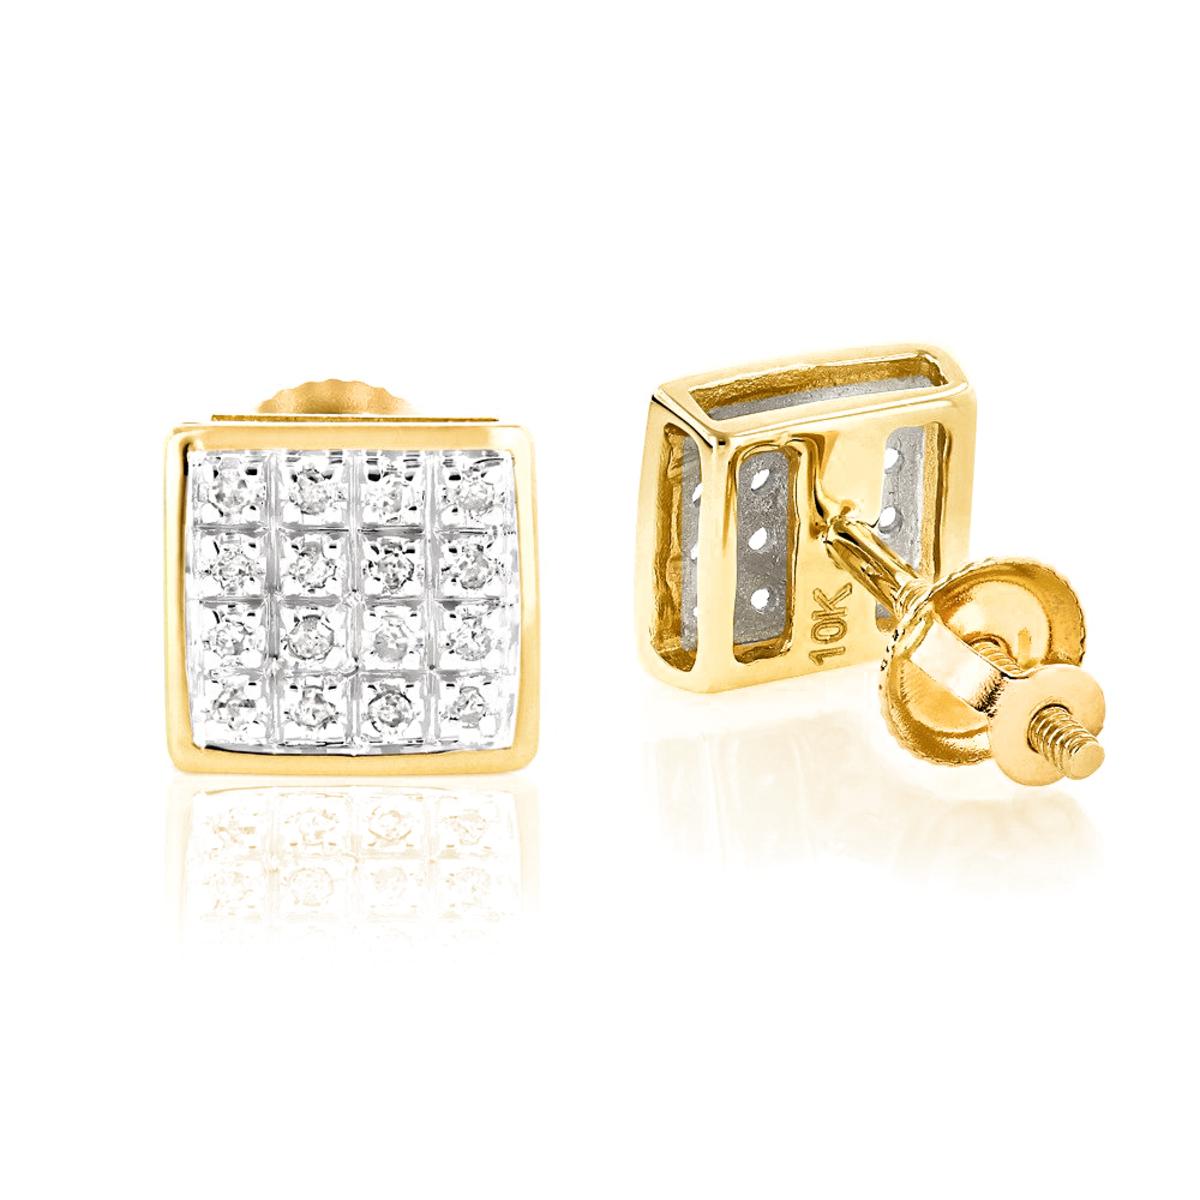 10K Yellow Gold Round Diamond Stud Earrings 0.18ct